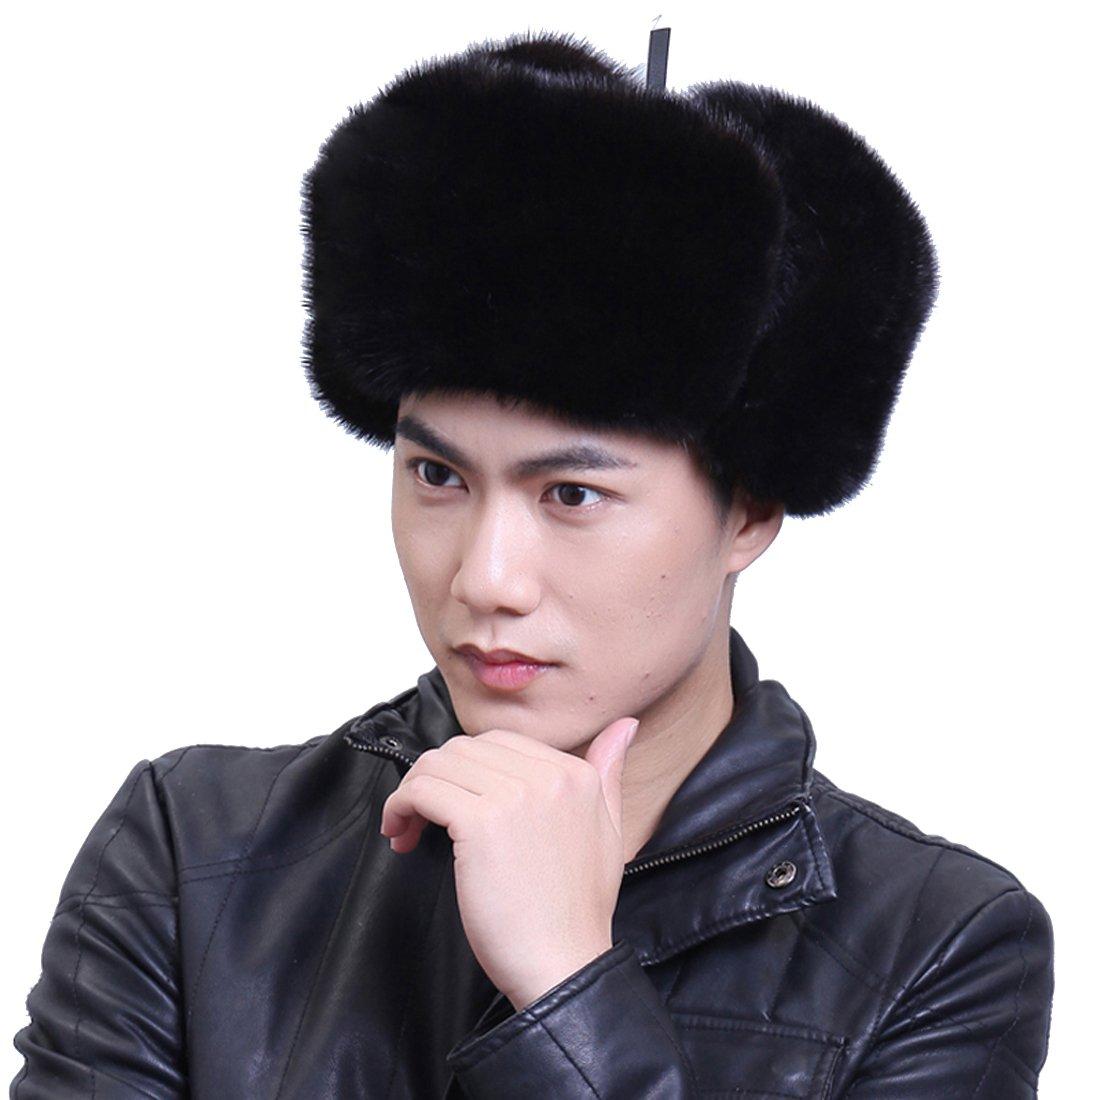 URSFUR Men's Mink Fur & Leather Russian Ushanka Hats (One Size, Black)